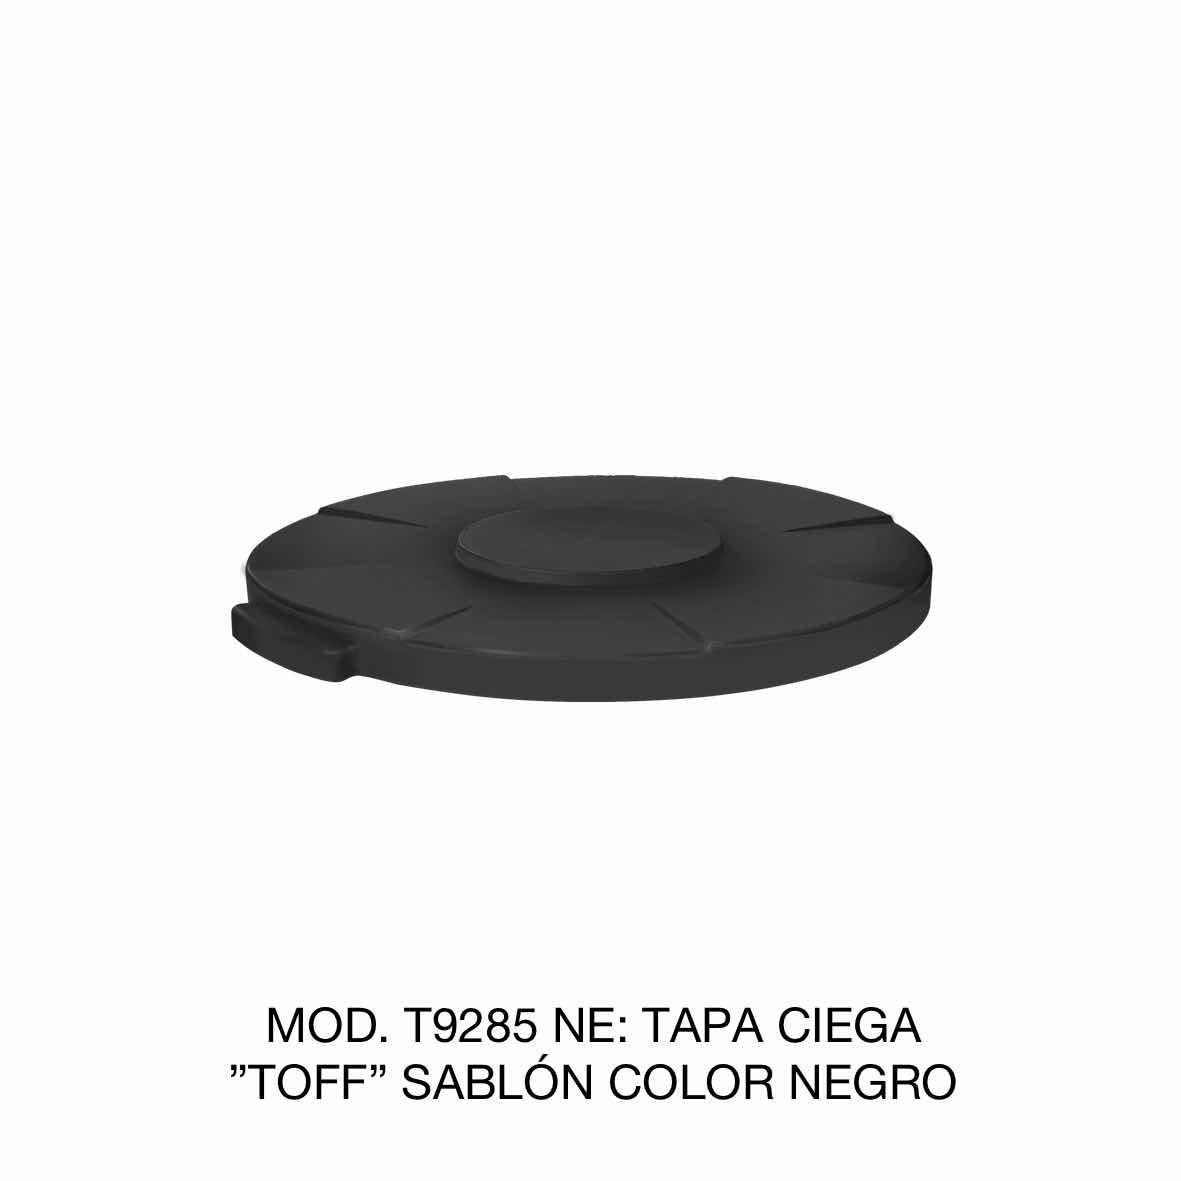 Tapa para contenedor de basura de 120 litros TOFF modelo T9285 NE color negro de Sablón